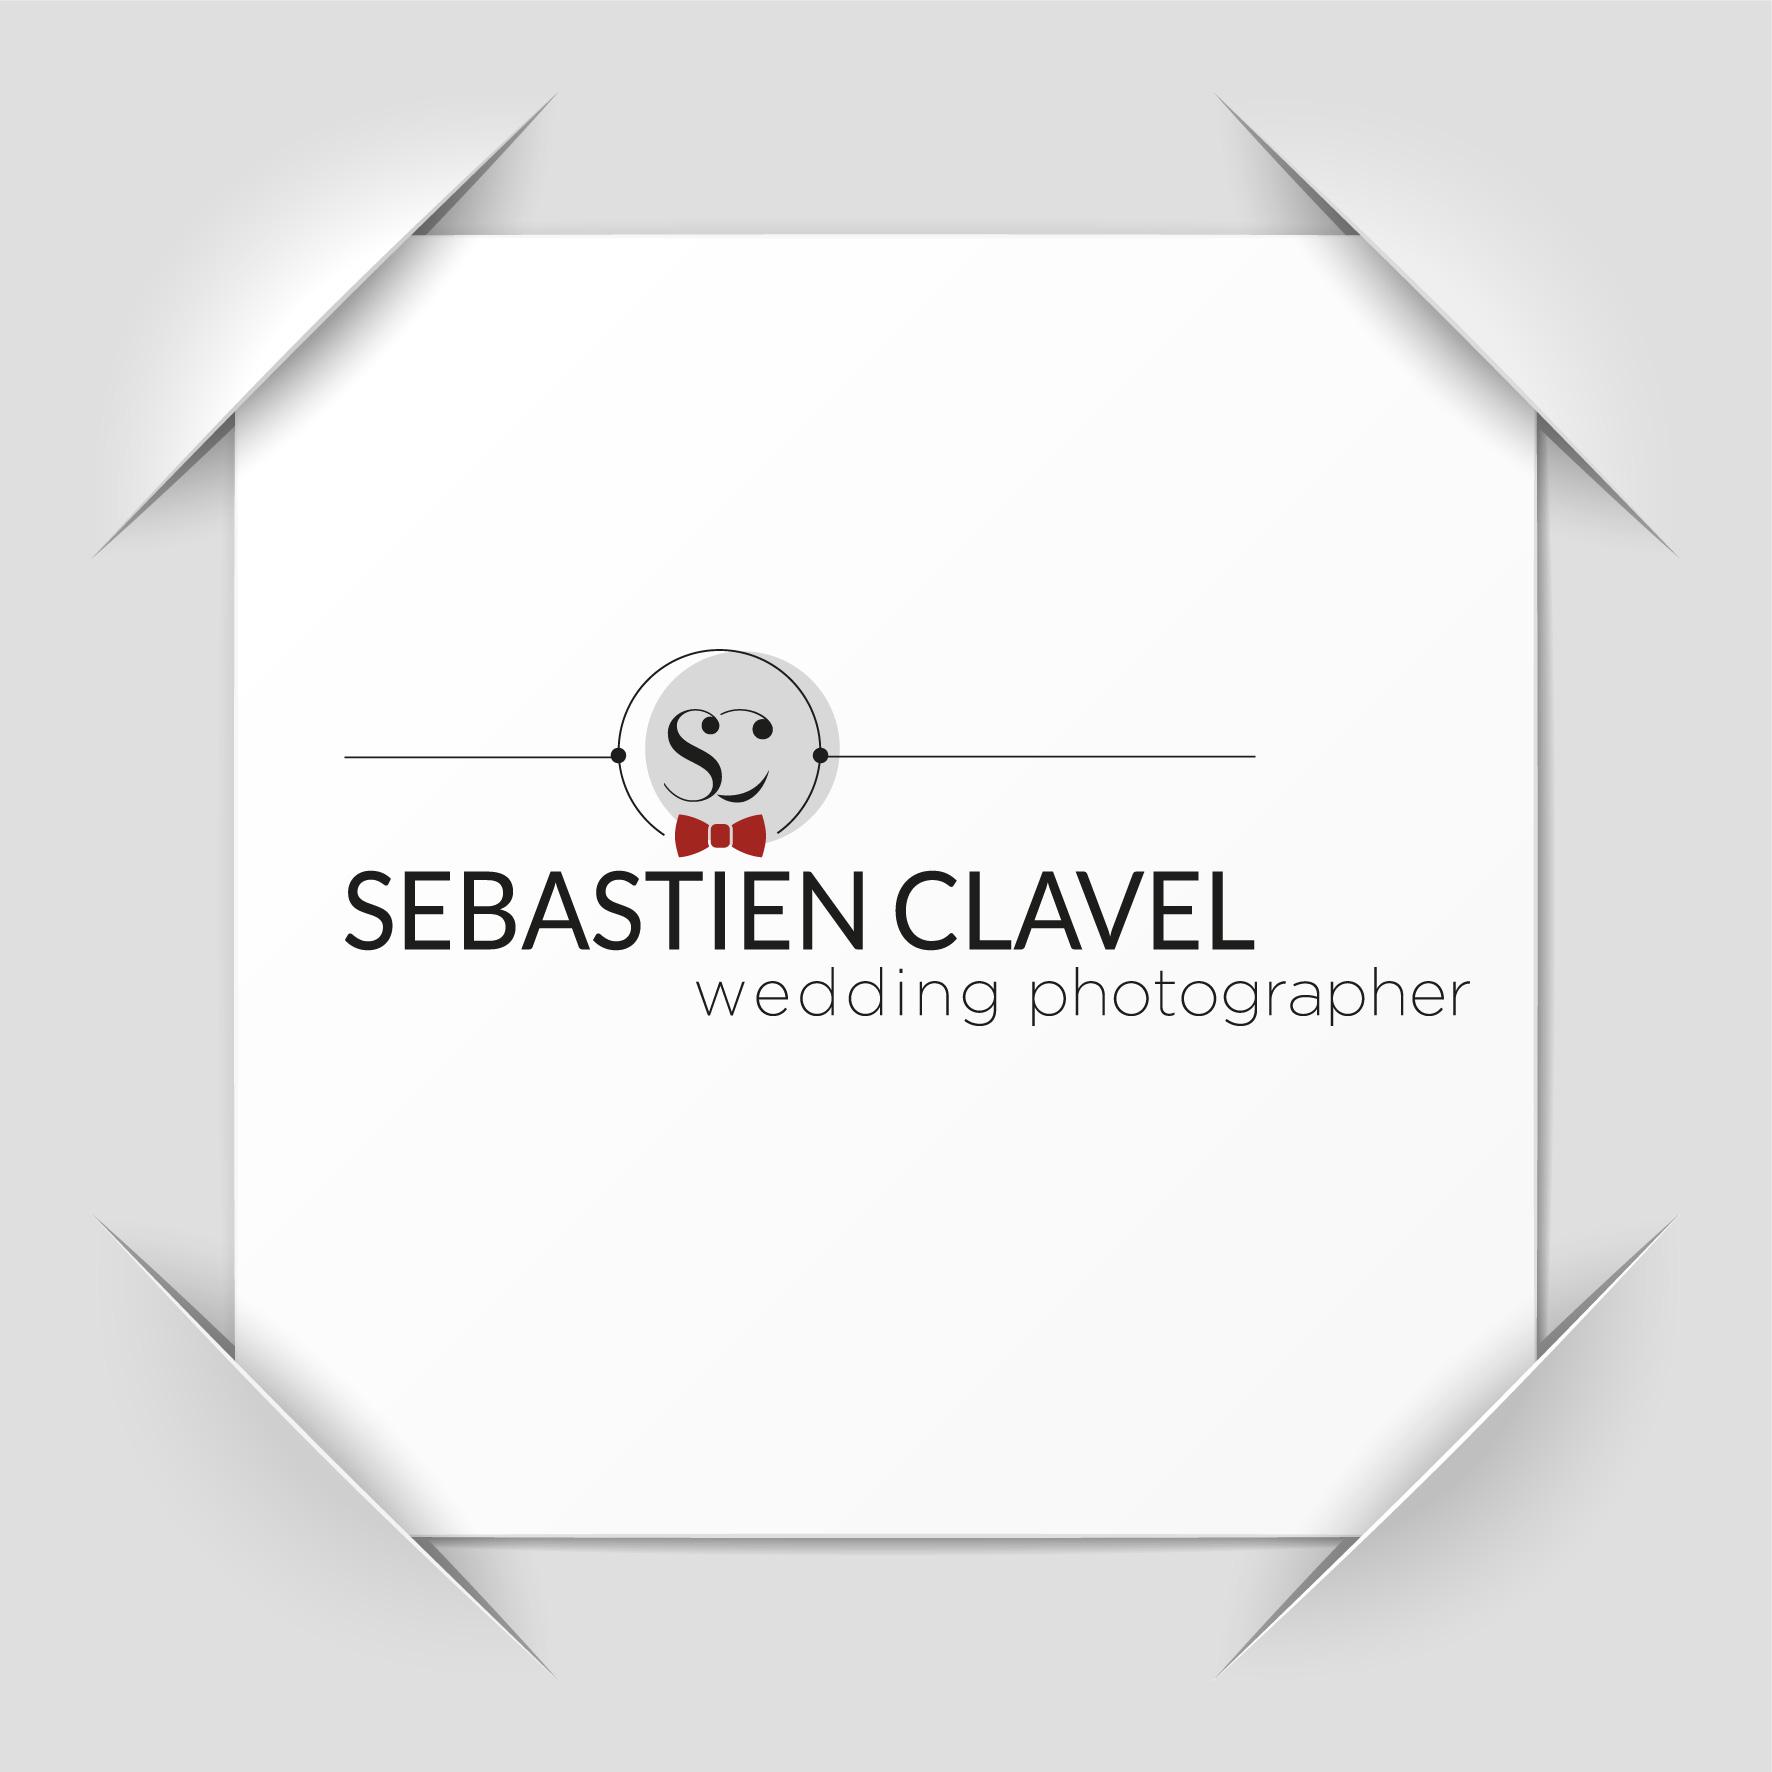 Sébastien Clavel Photographe